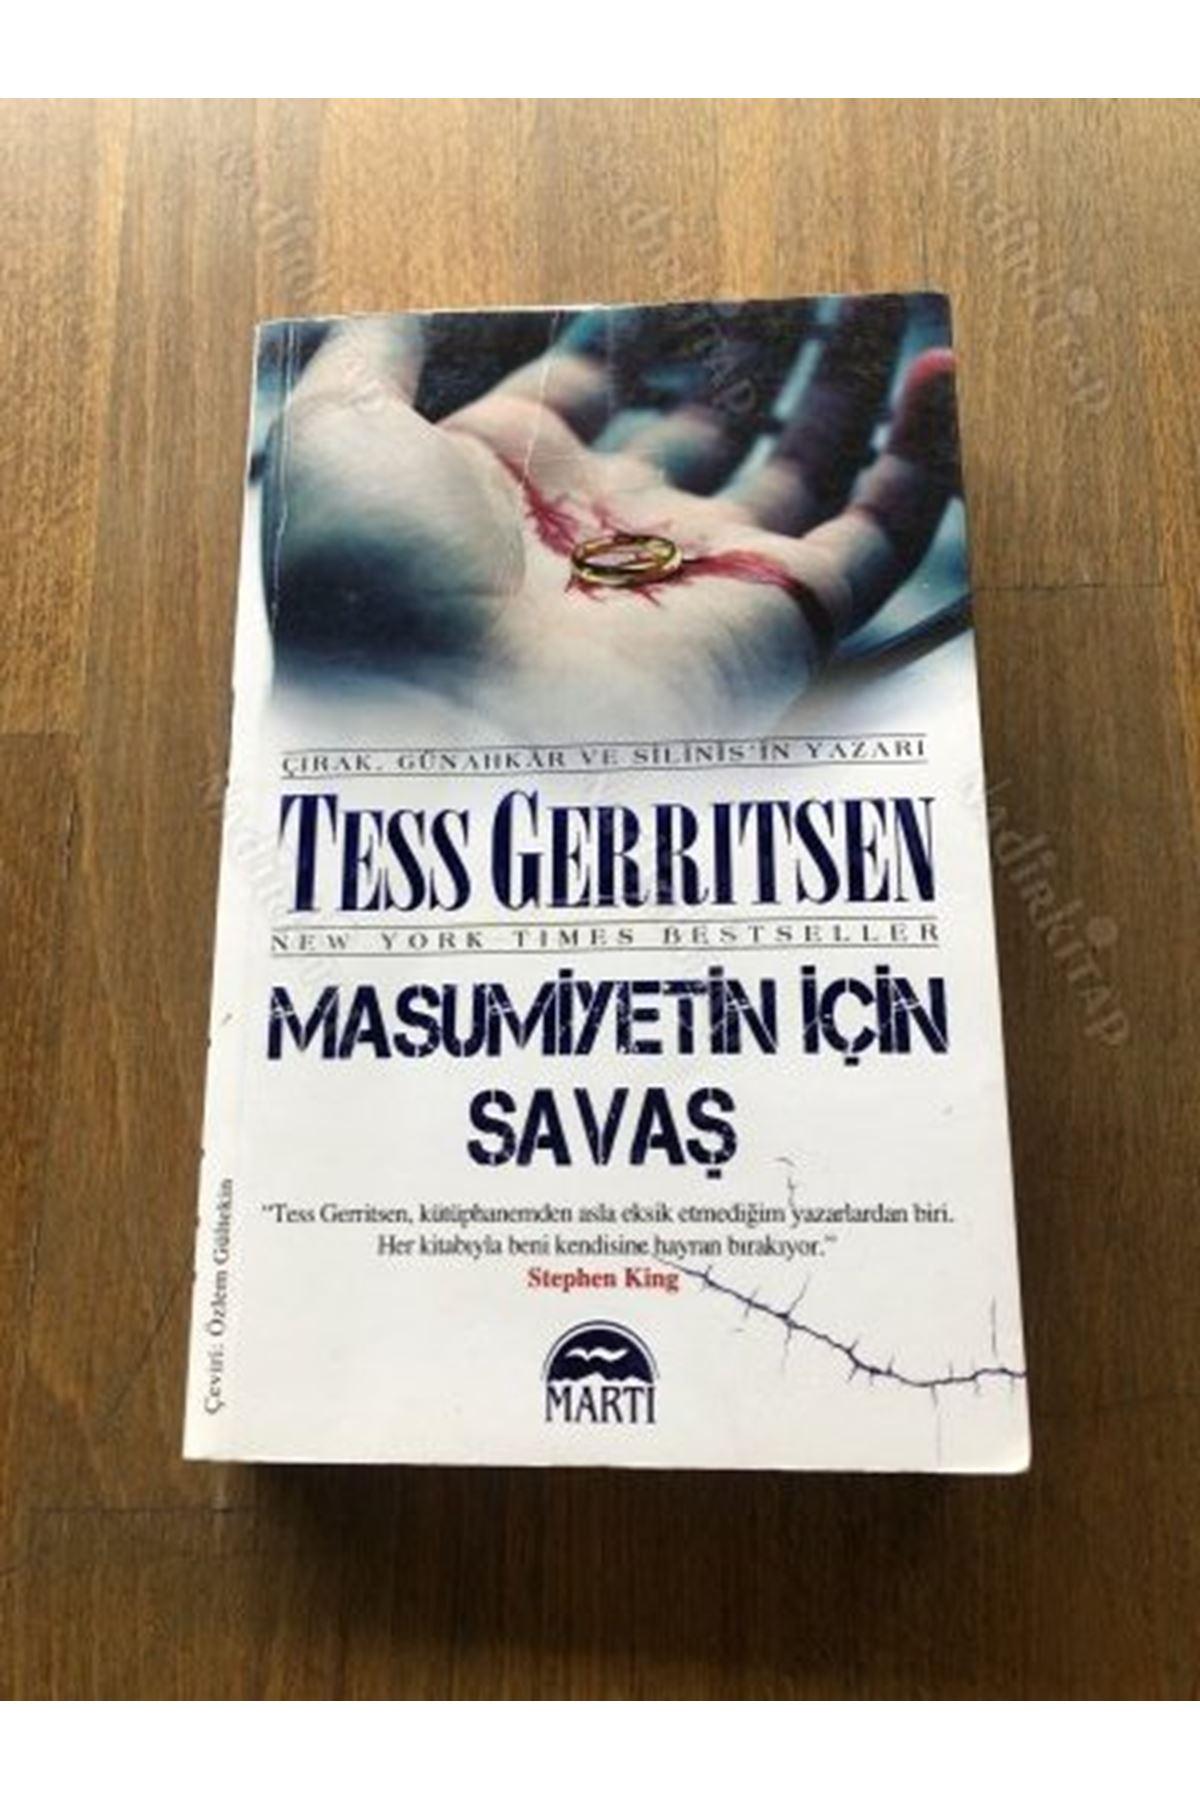 TESS GERRITSEN - MASUMİYETİN İÇİN SAVAŞ